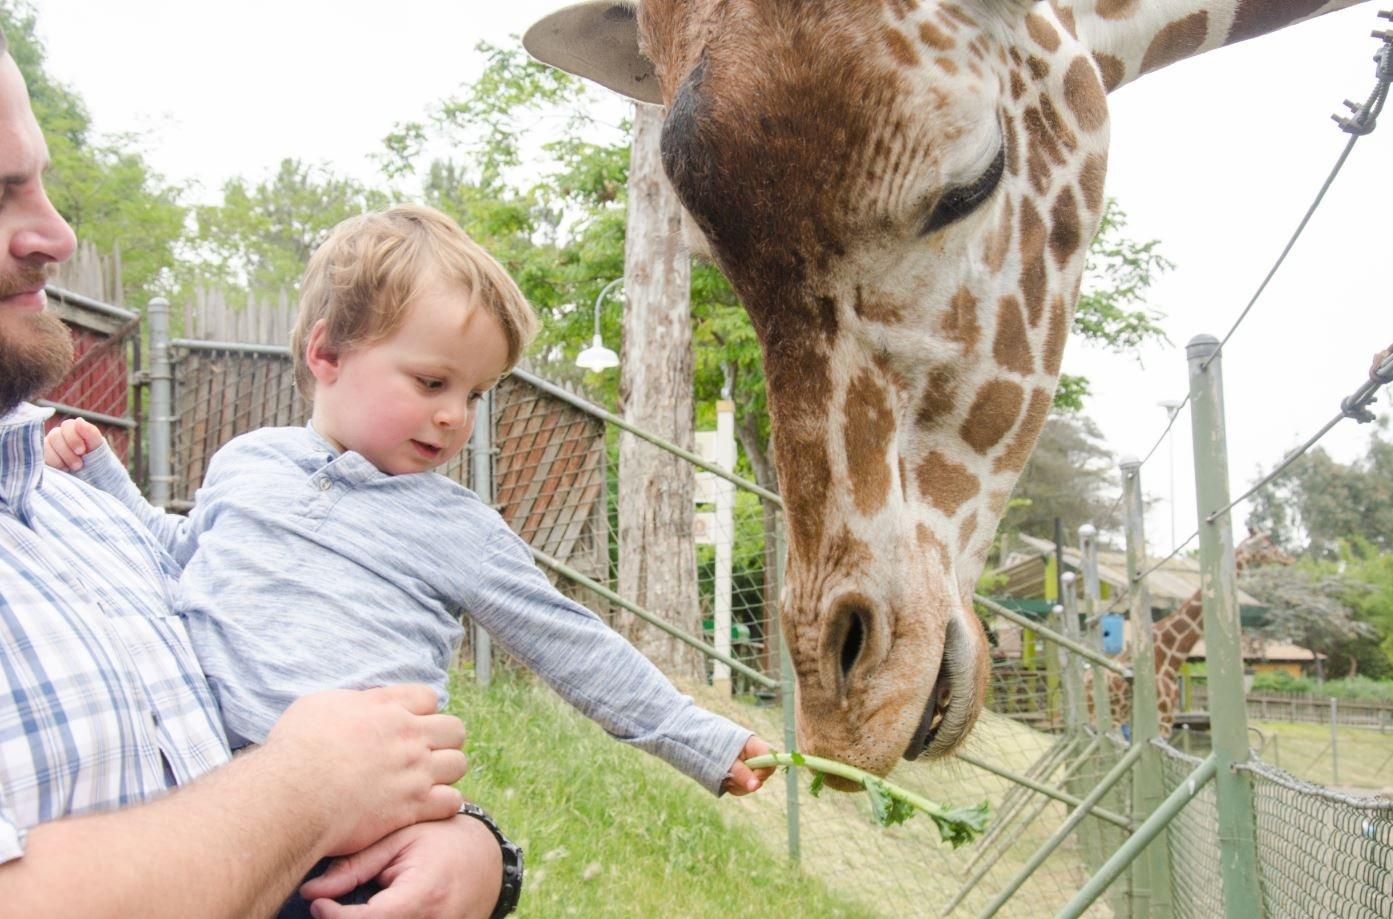 Child with giraffe